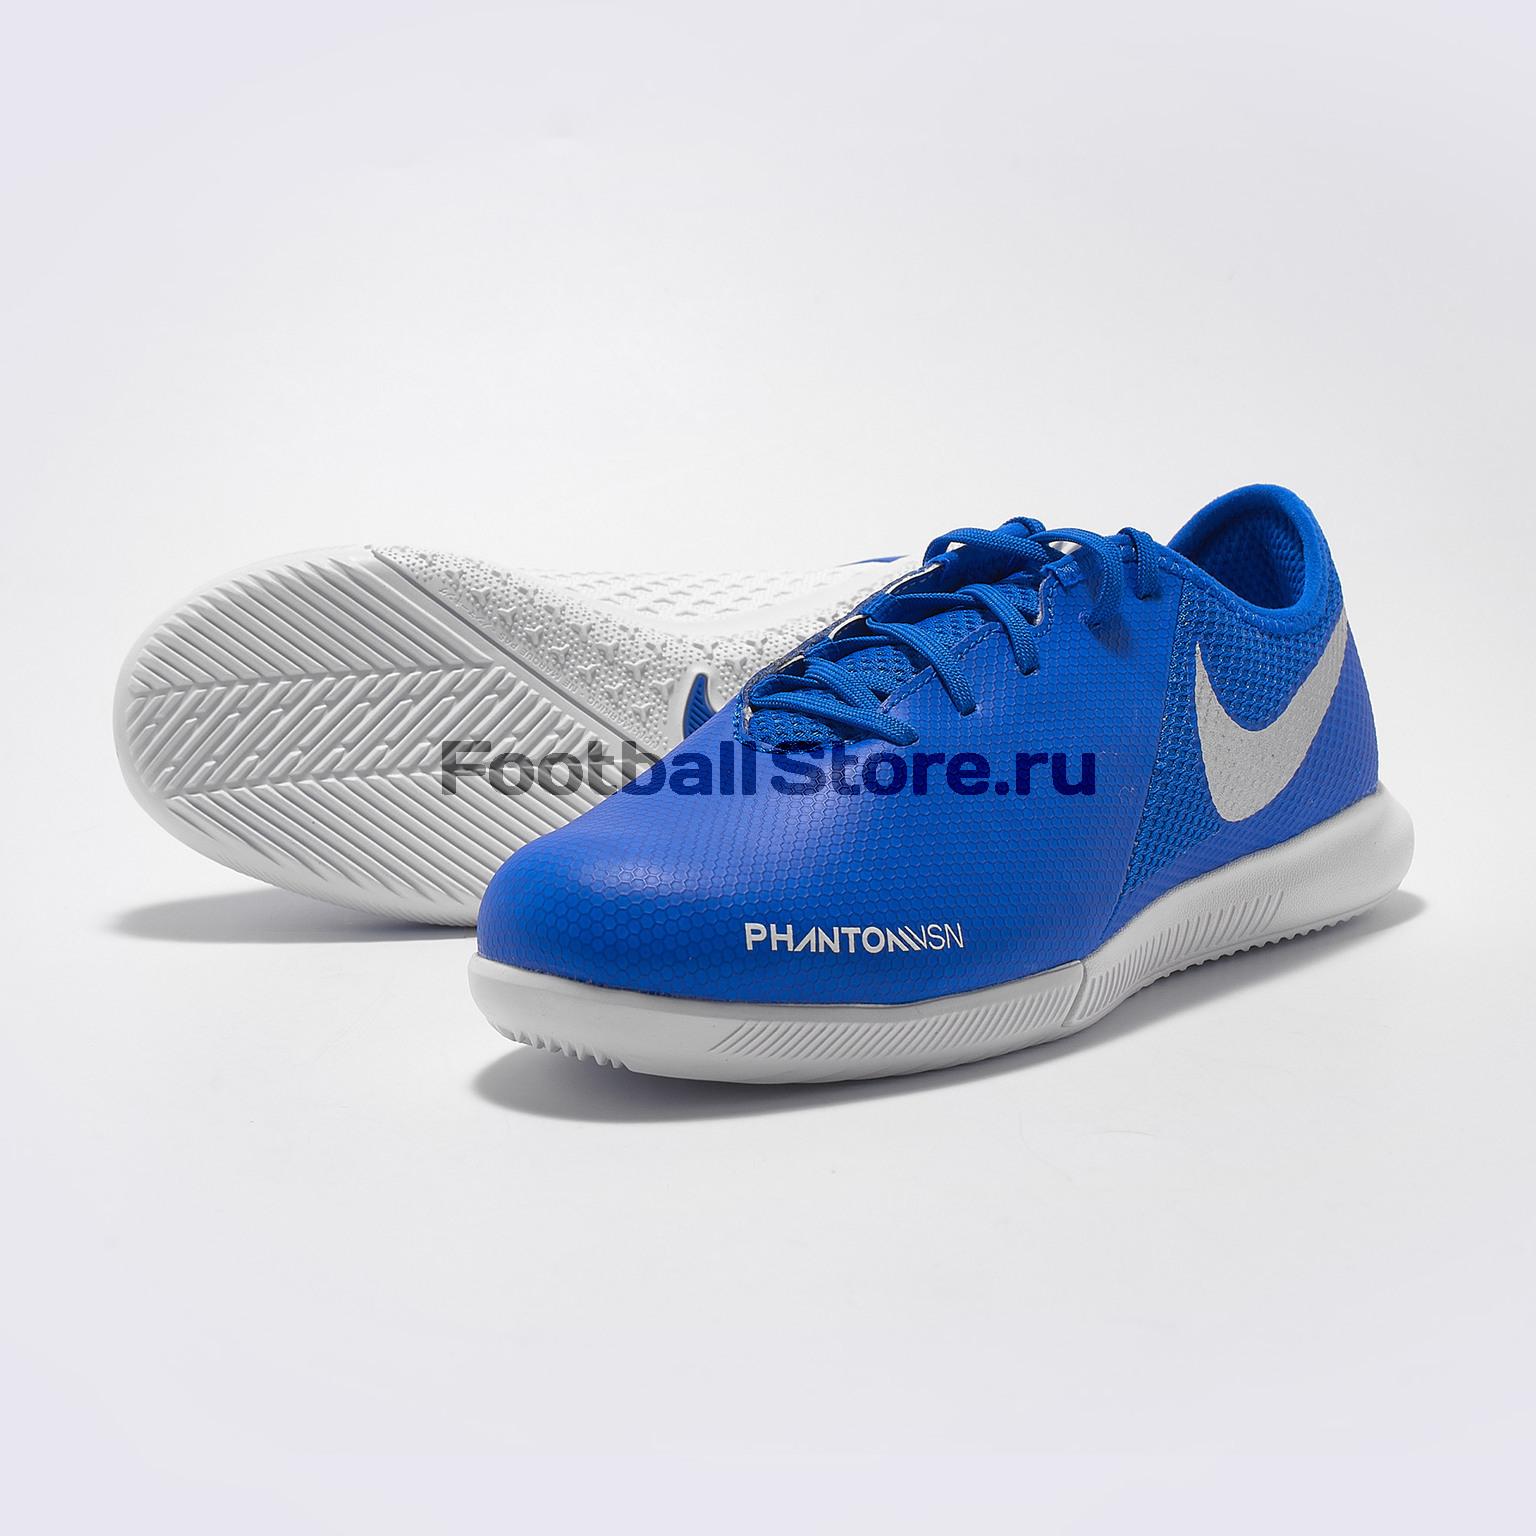 Футзалки детские Nike Phantom Vision Academy IC AR4345-410 цена и фото